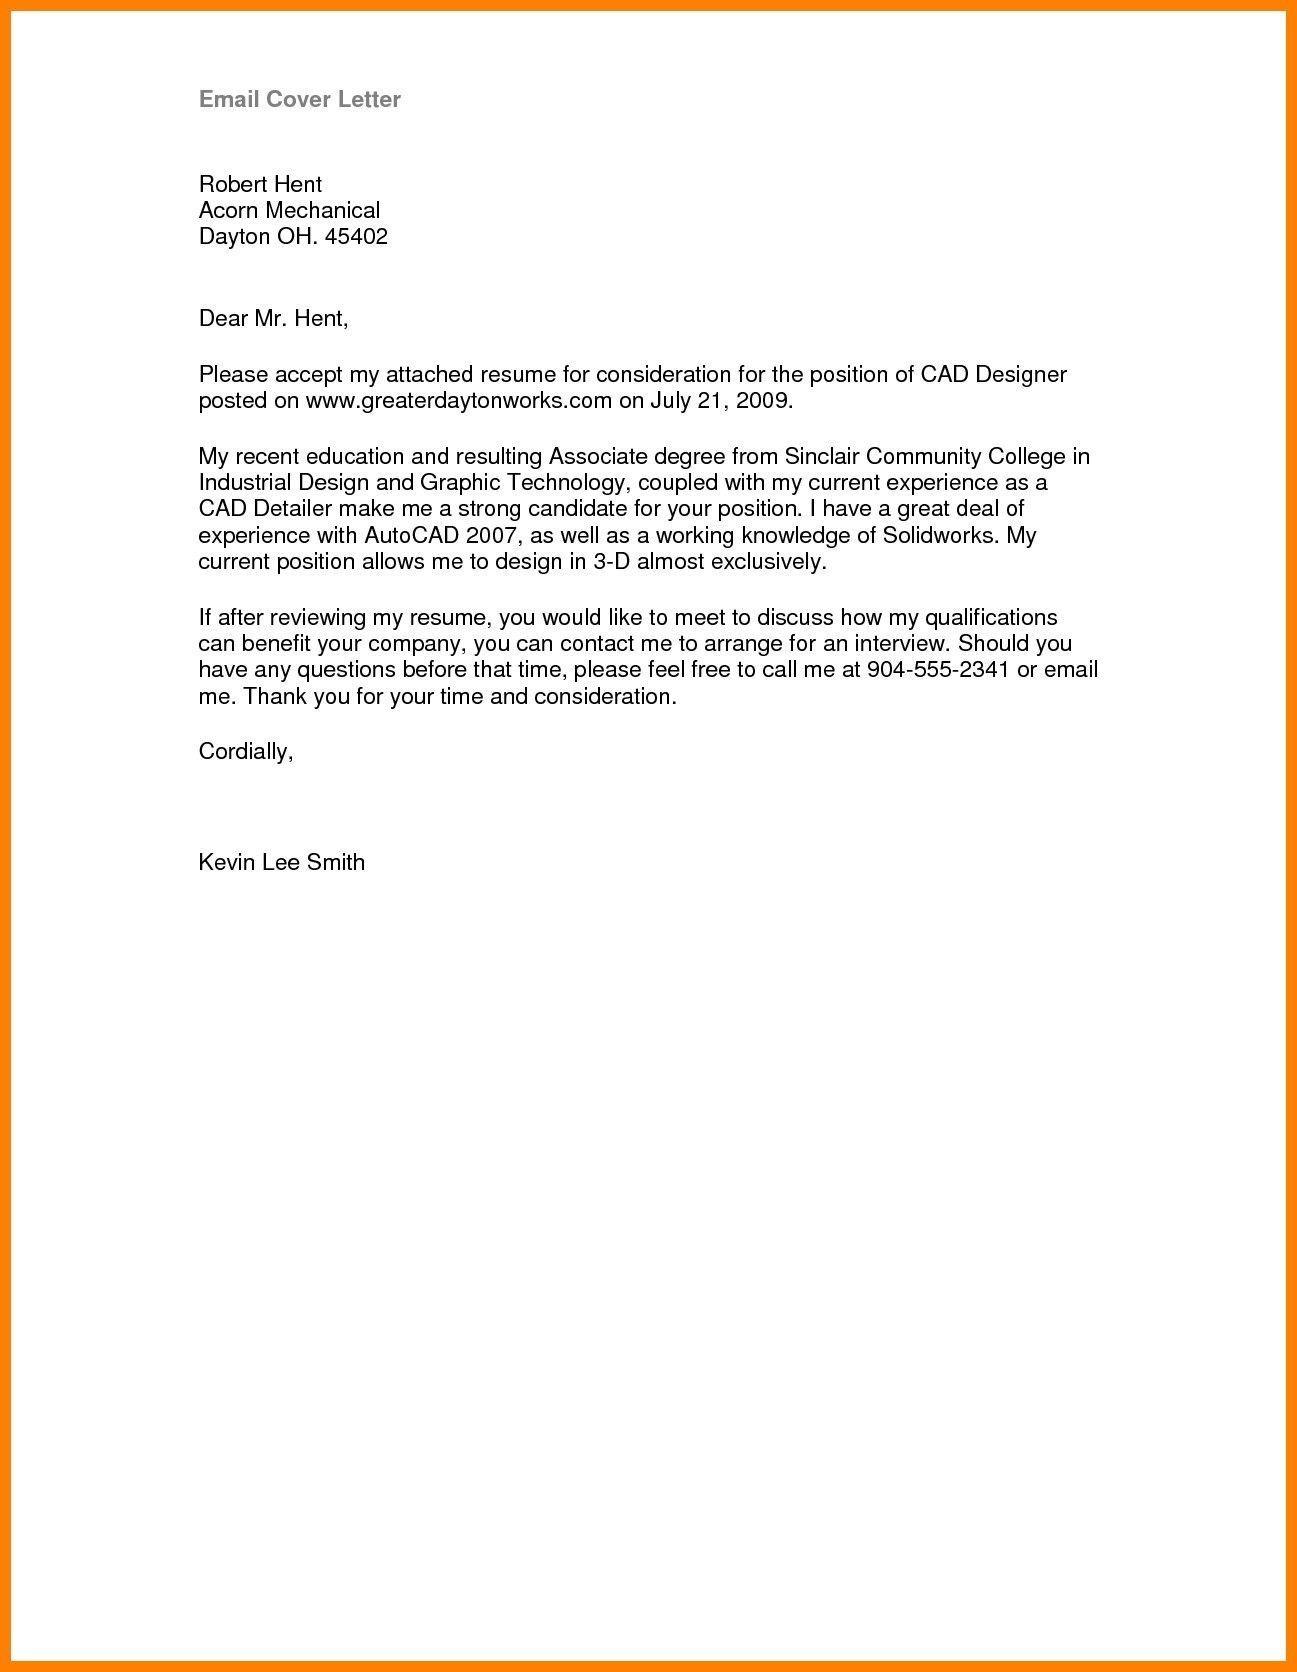 003 Marvelou Email Cover Letter Example For Resume Design  Sample Through AttachedFull